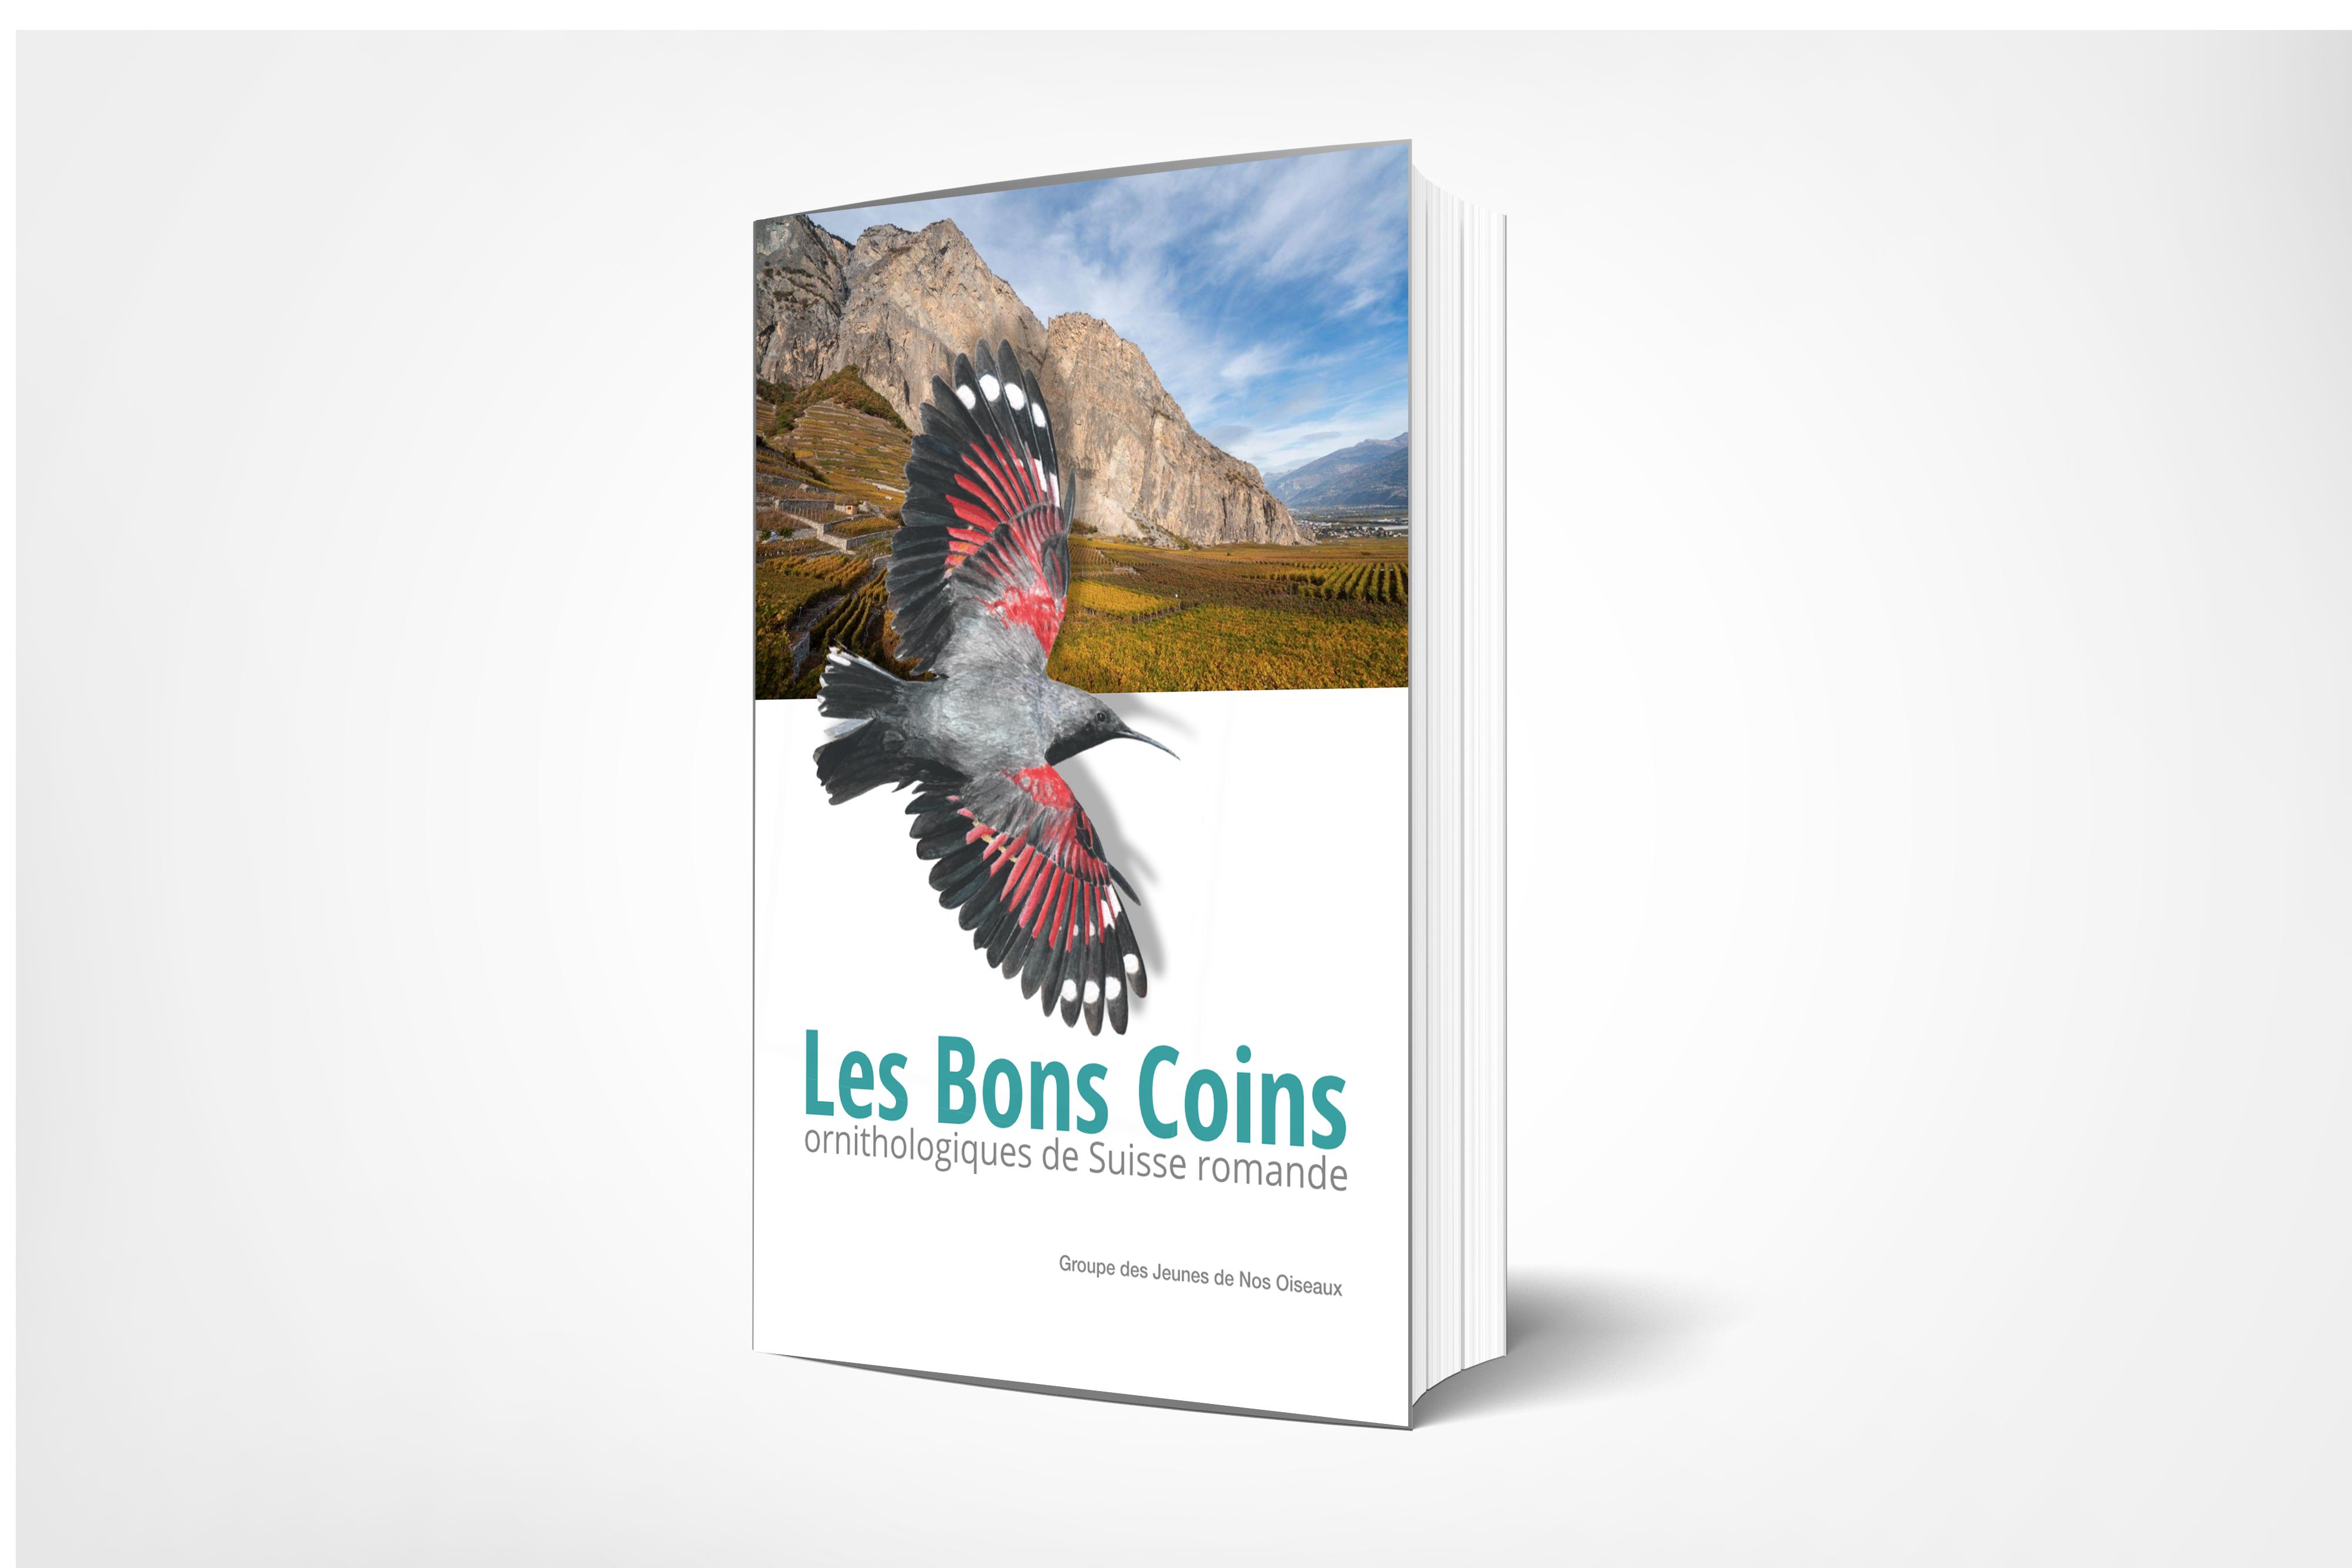 https://cdnfiles1.biolovision.net/gdj.nosoiseaux.ch/userfiles/Couverture3Dtest.jpg